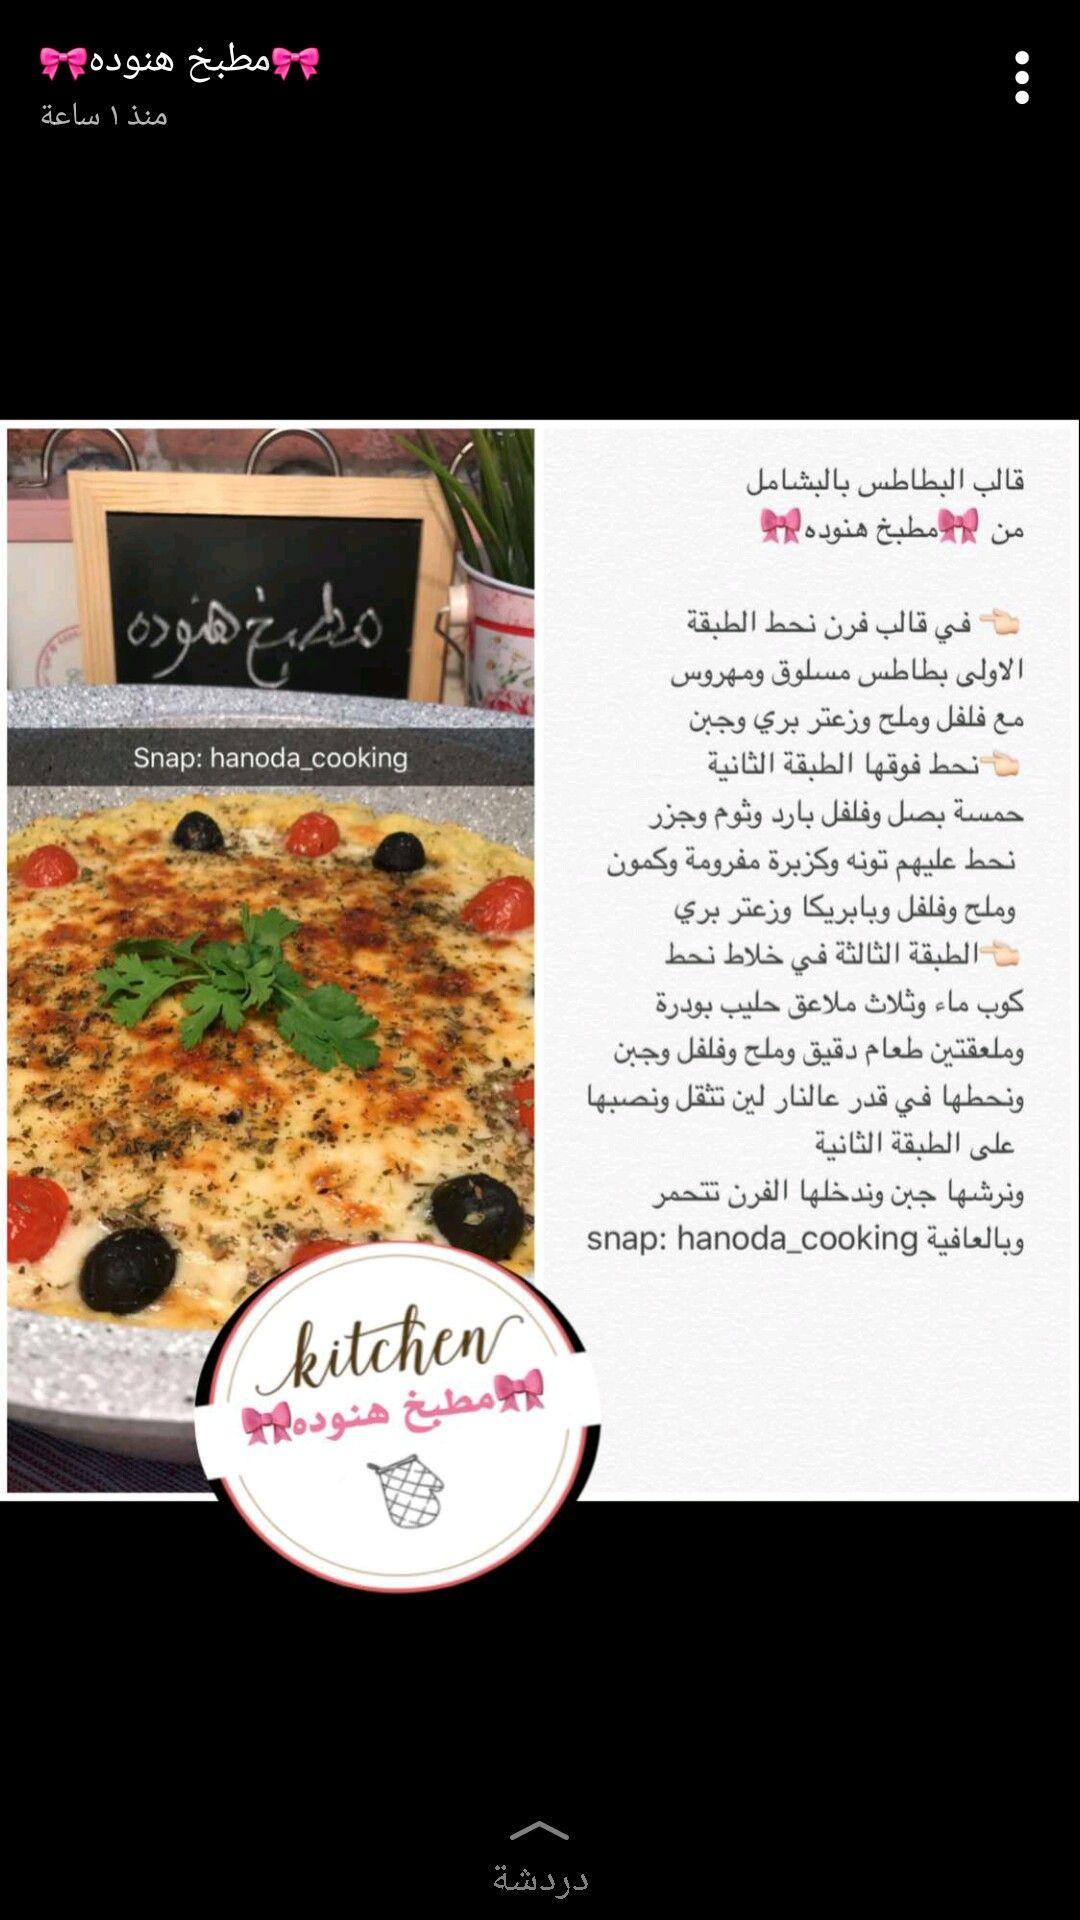 Pin by lamq20 on طبخ Arabic food, Food, Cooking